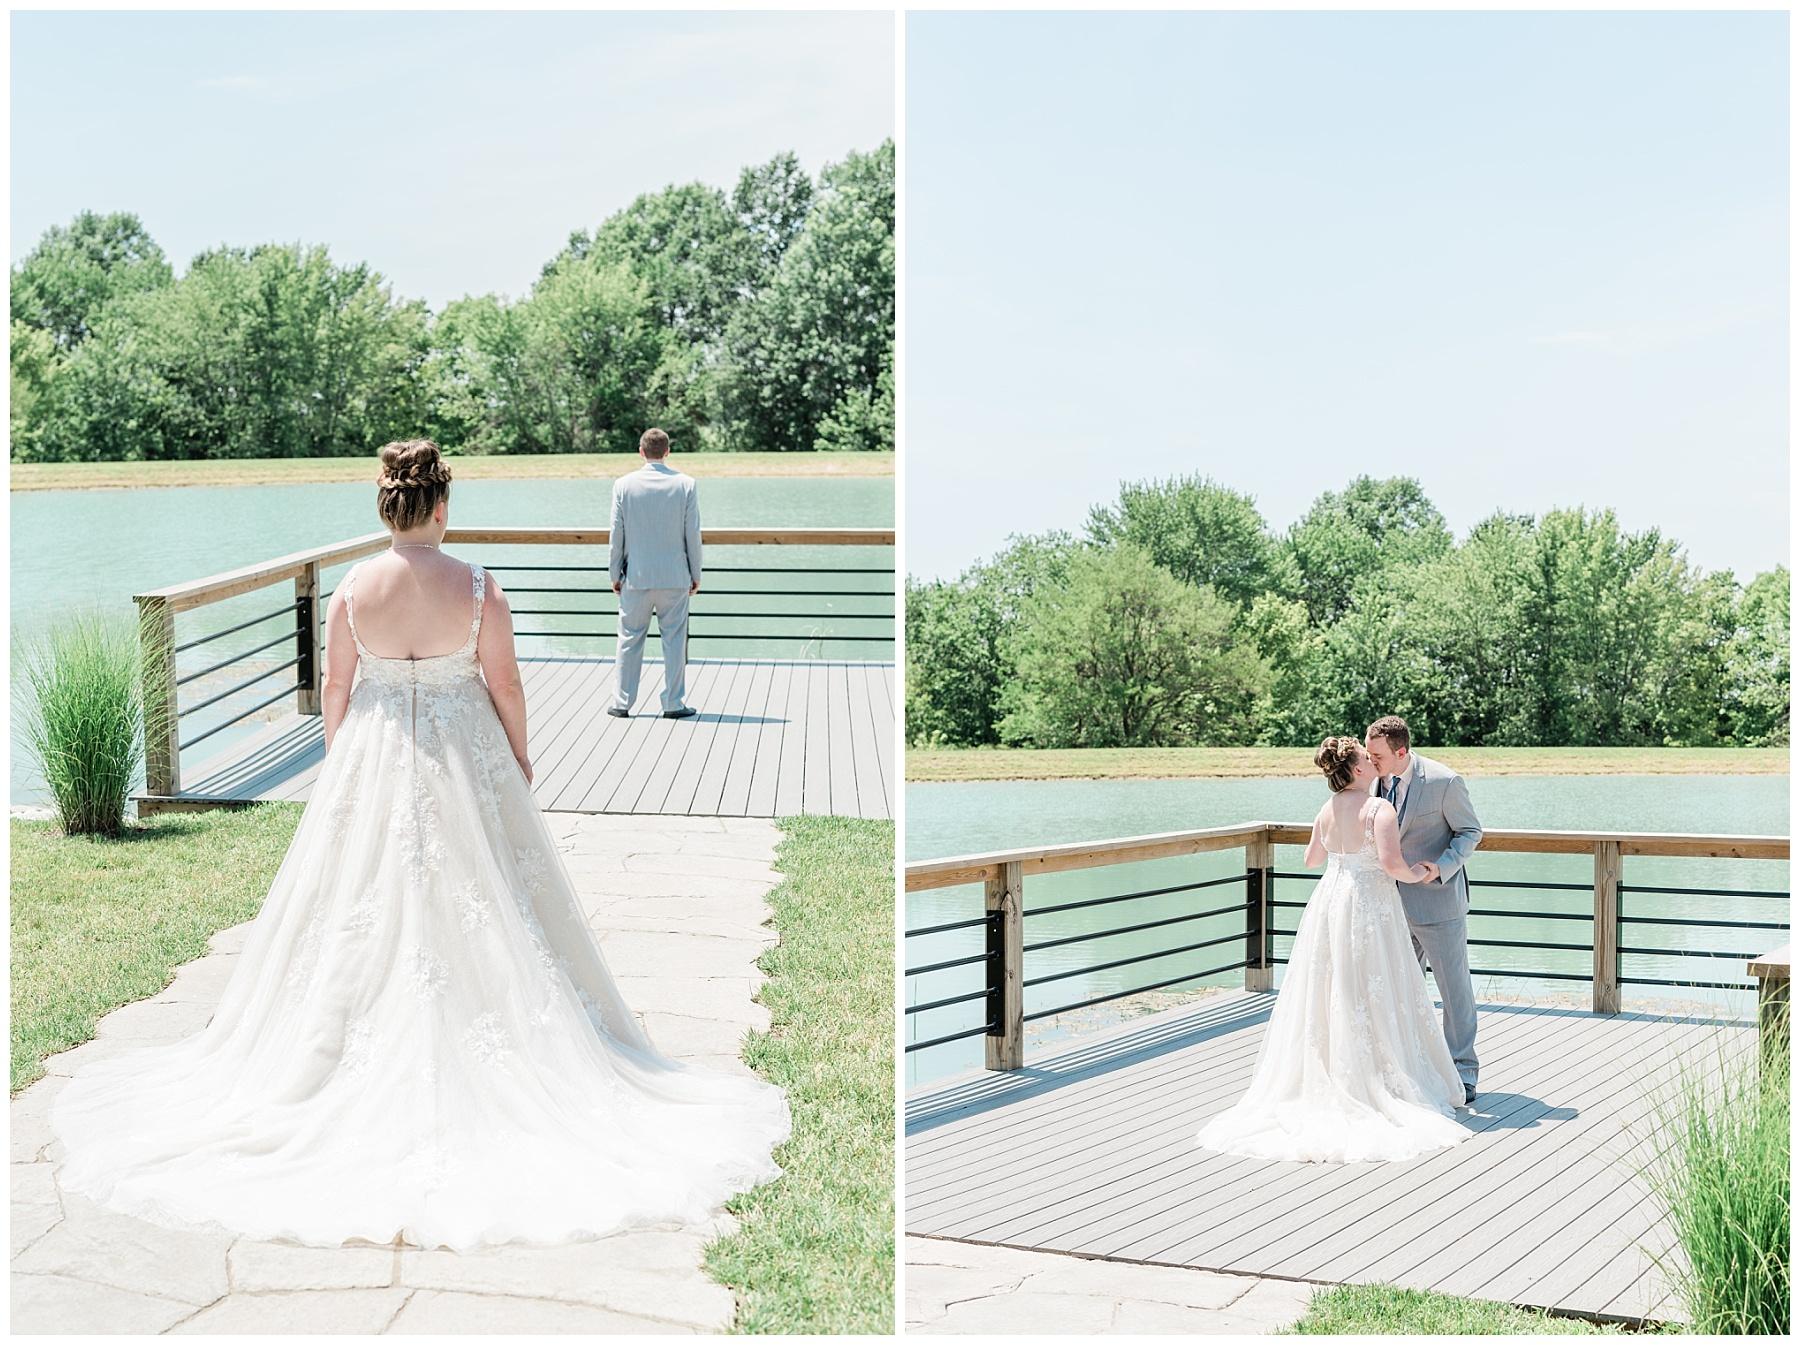 Intimate Summer Wedding at Emerson Fields by Kelsi Kliethermes Photography Best Missouri and Maui Wedding Photographer_0034.jpg